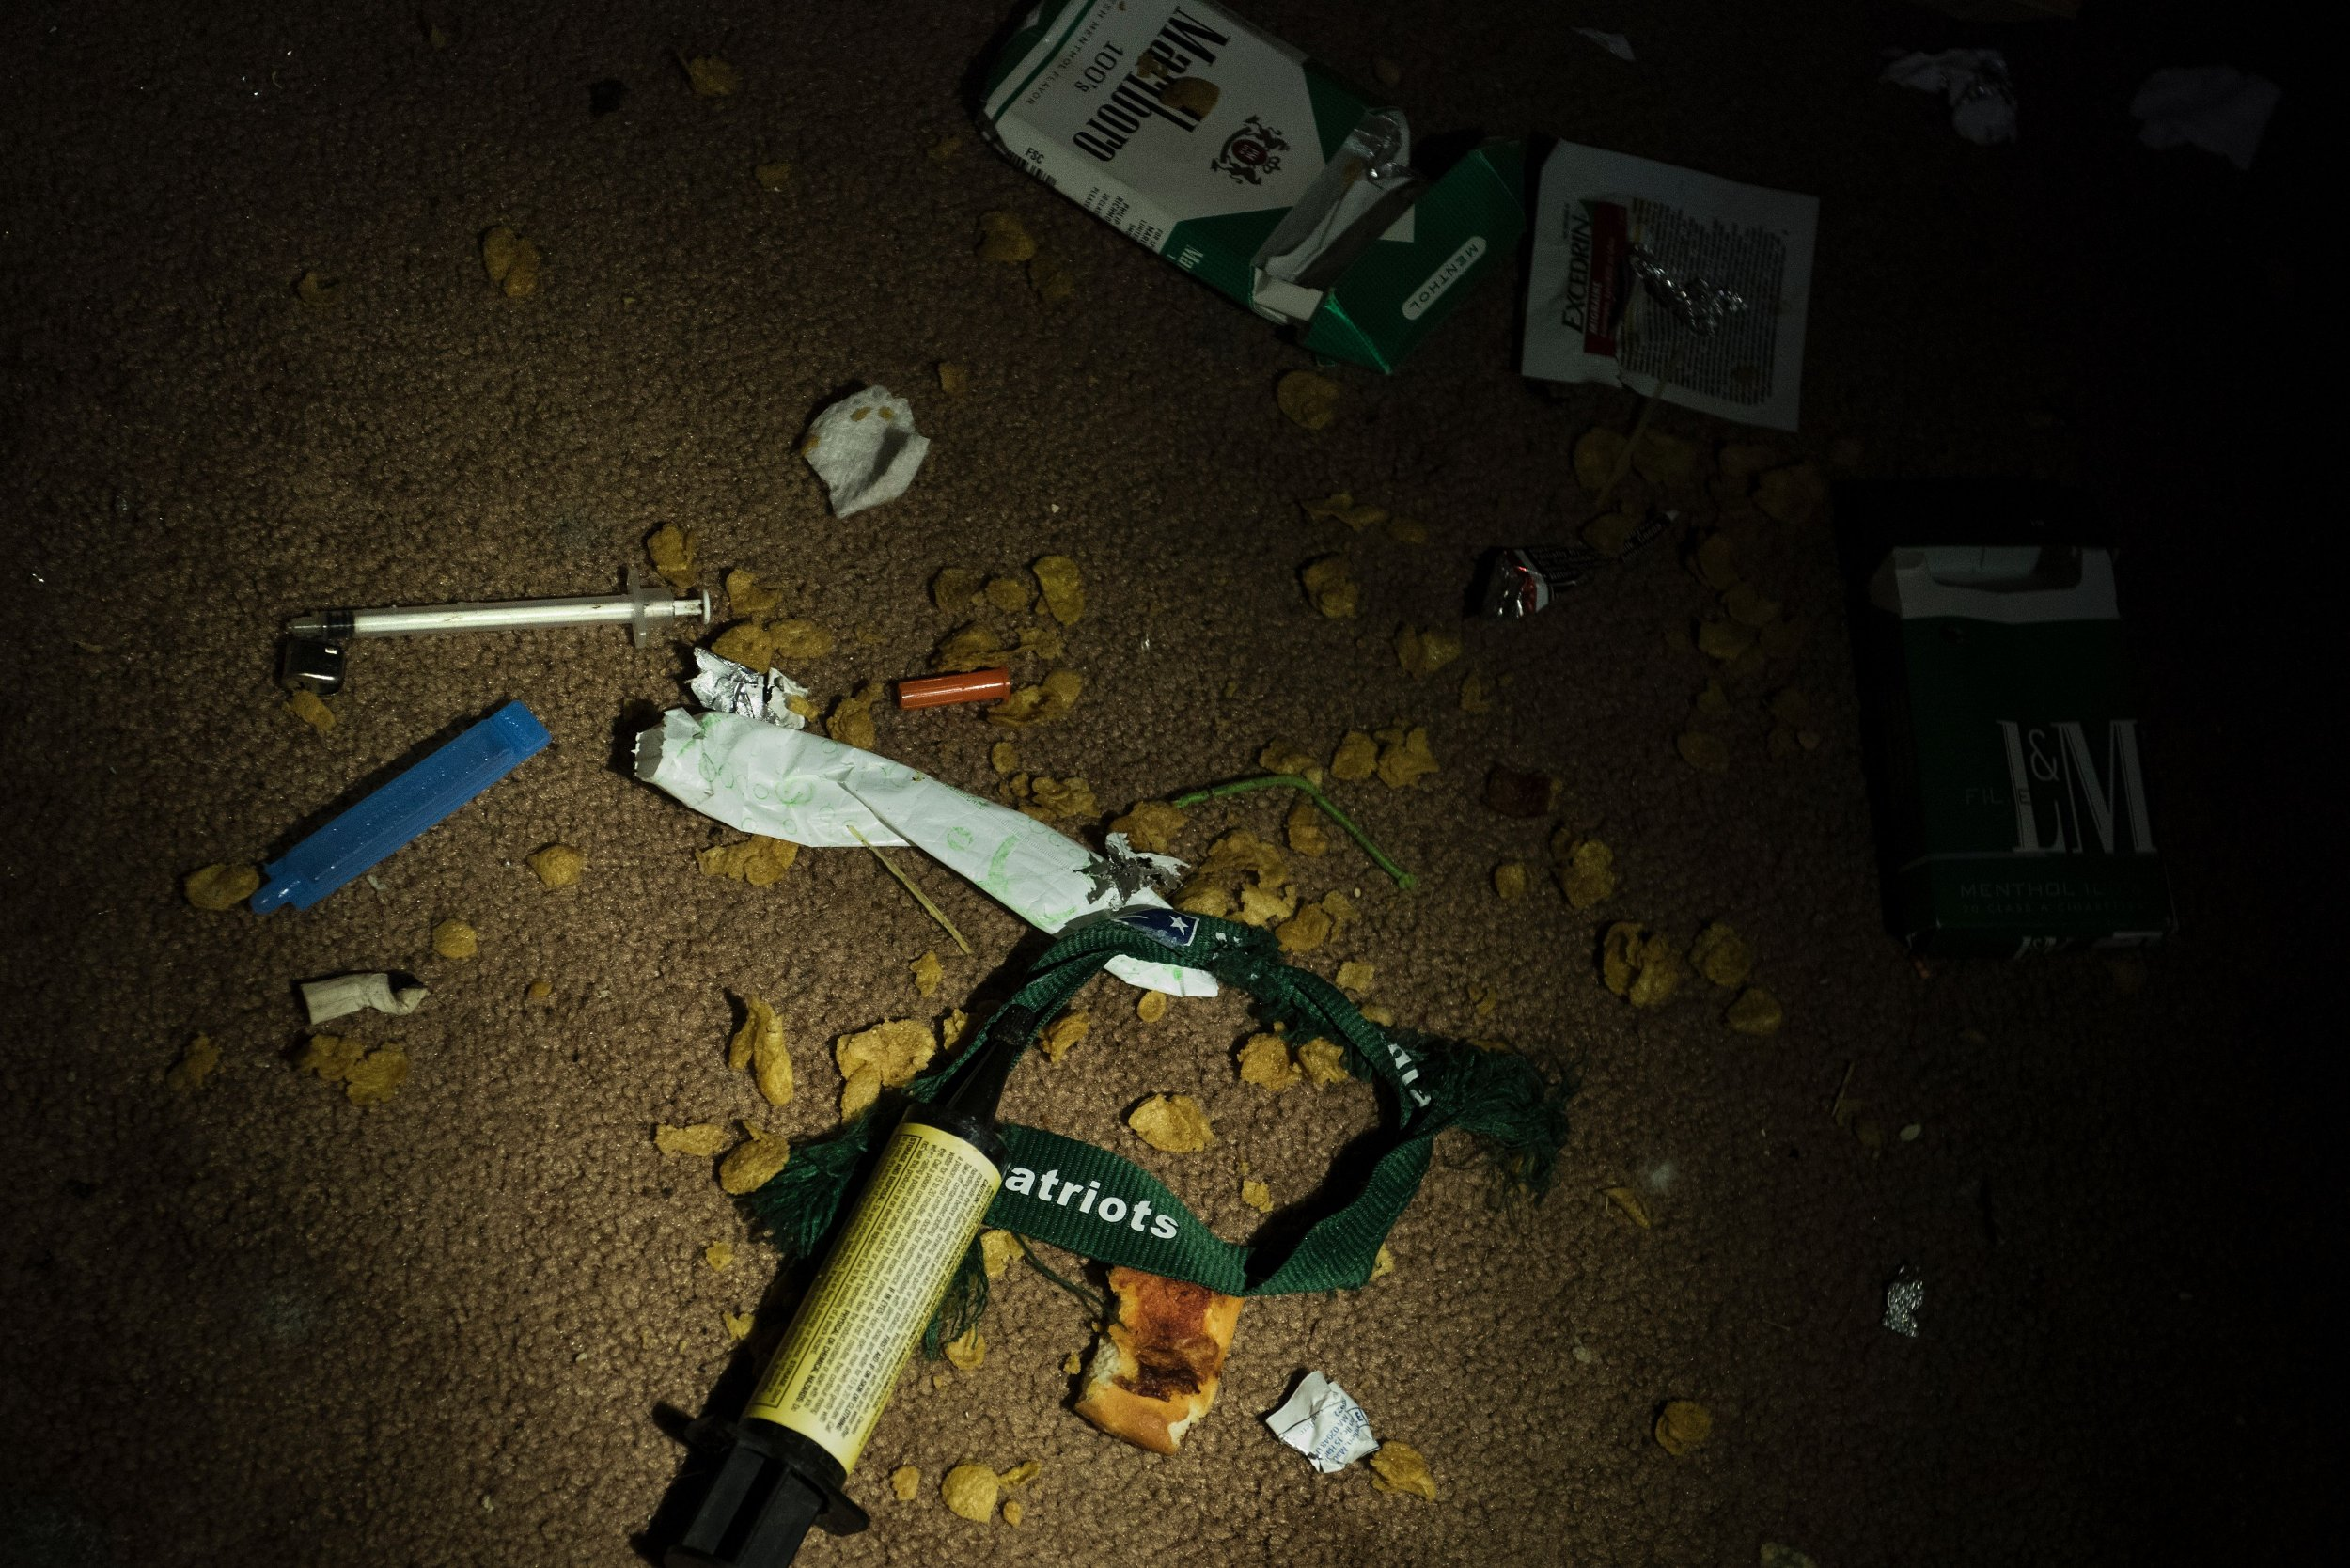 Fentanyl: The opioid epidemic that's killing America